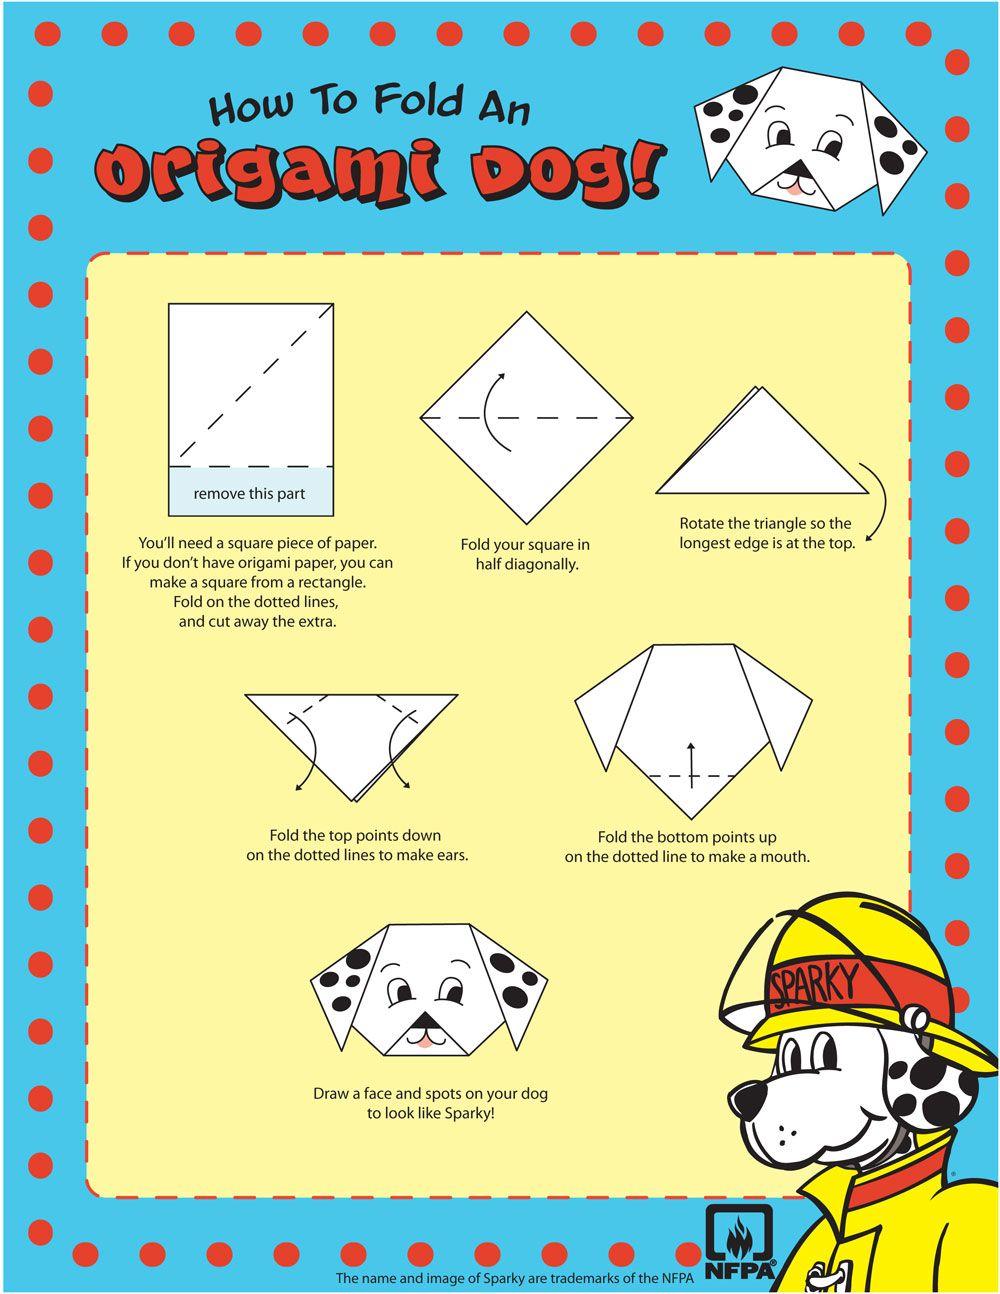 Origami Dog | Sparky.org